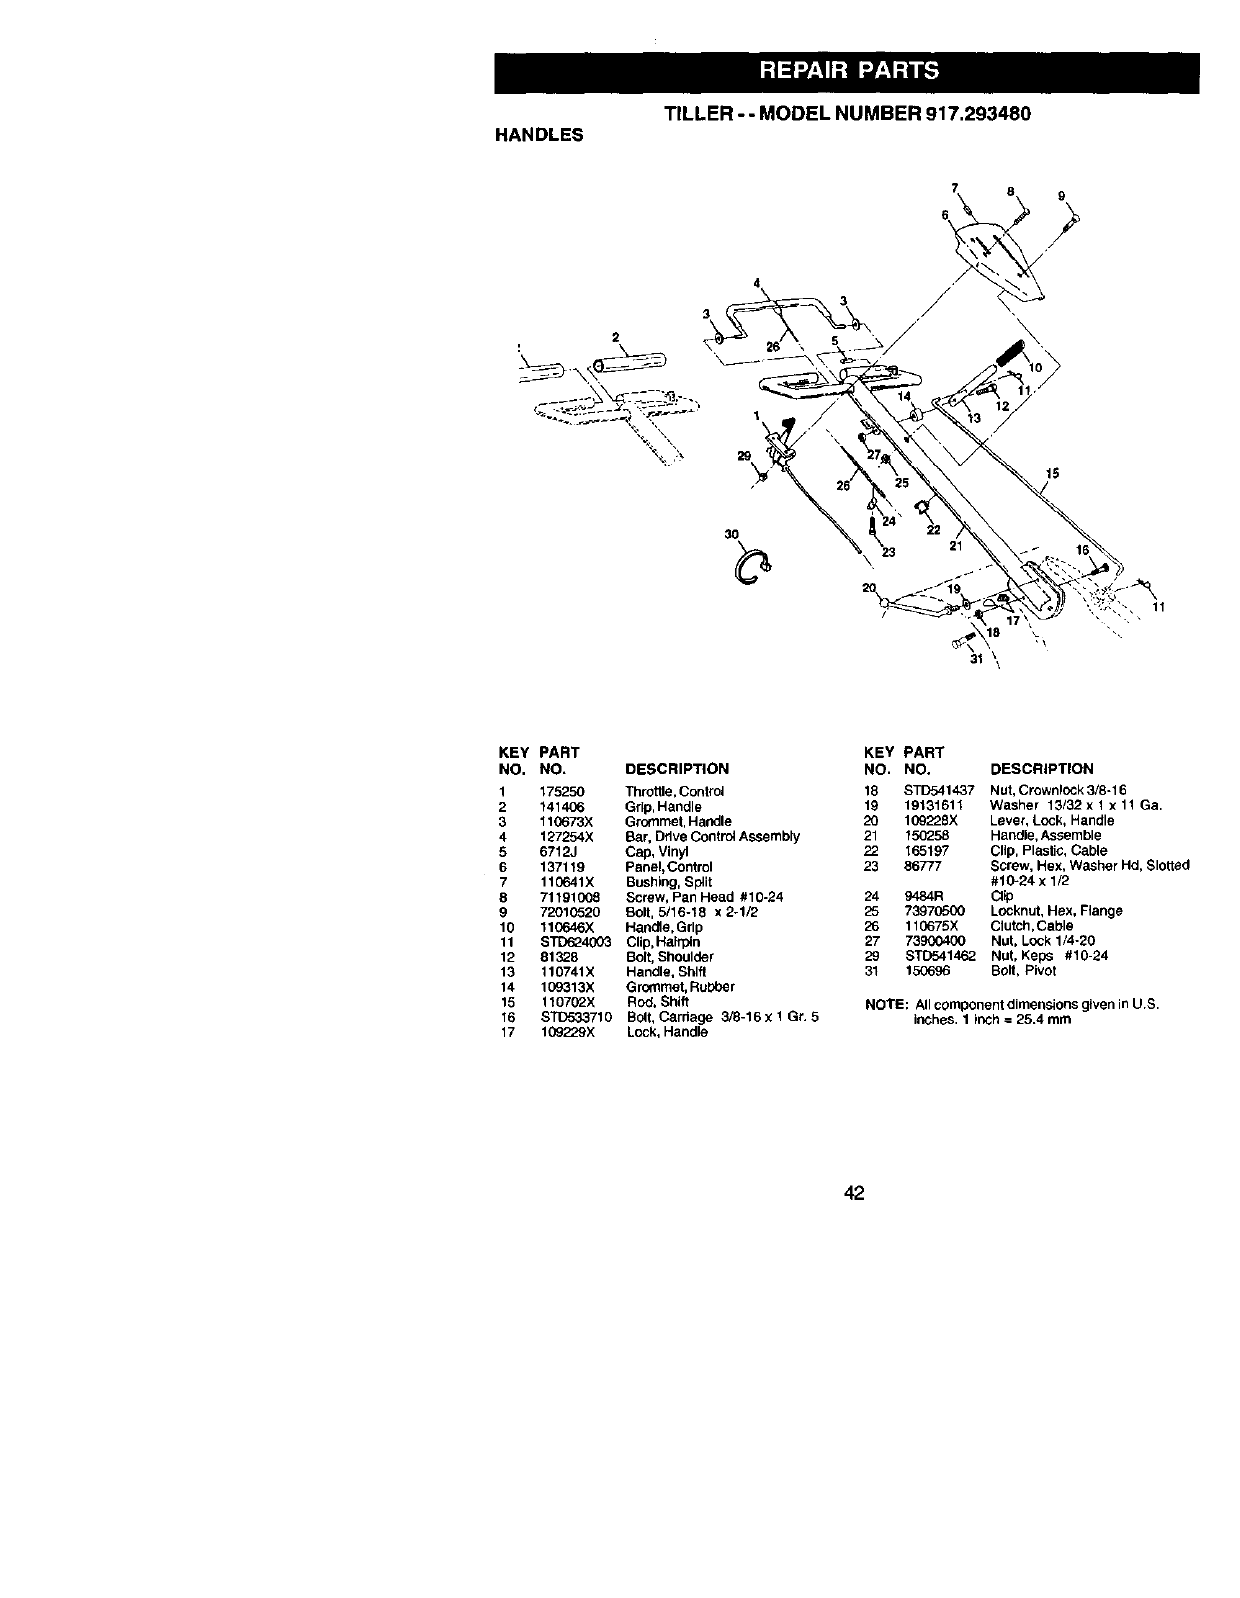 Craftsman 917293480 User Manual REAR TINE TILLER Manuals